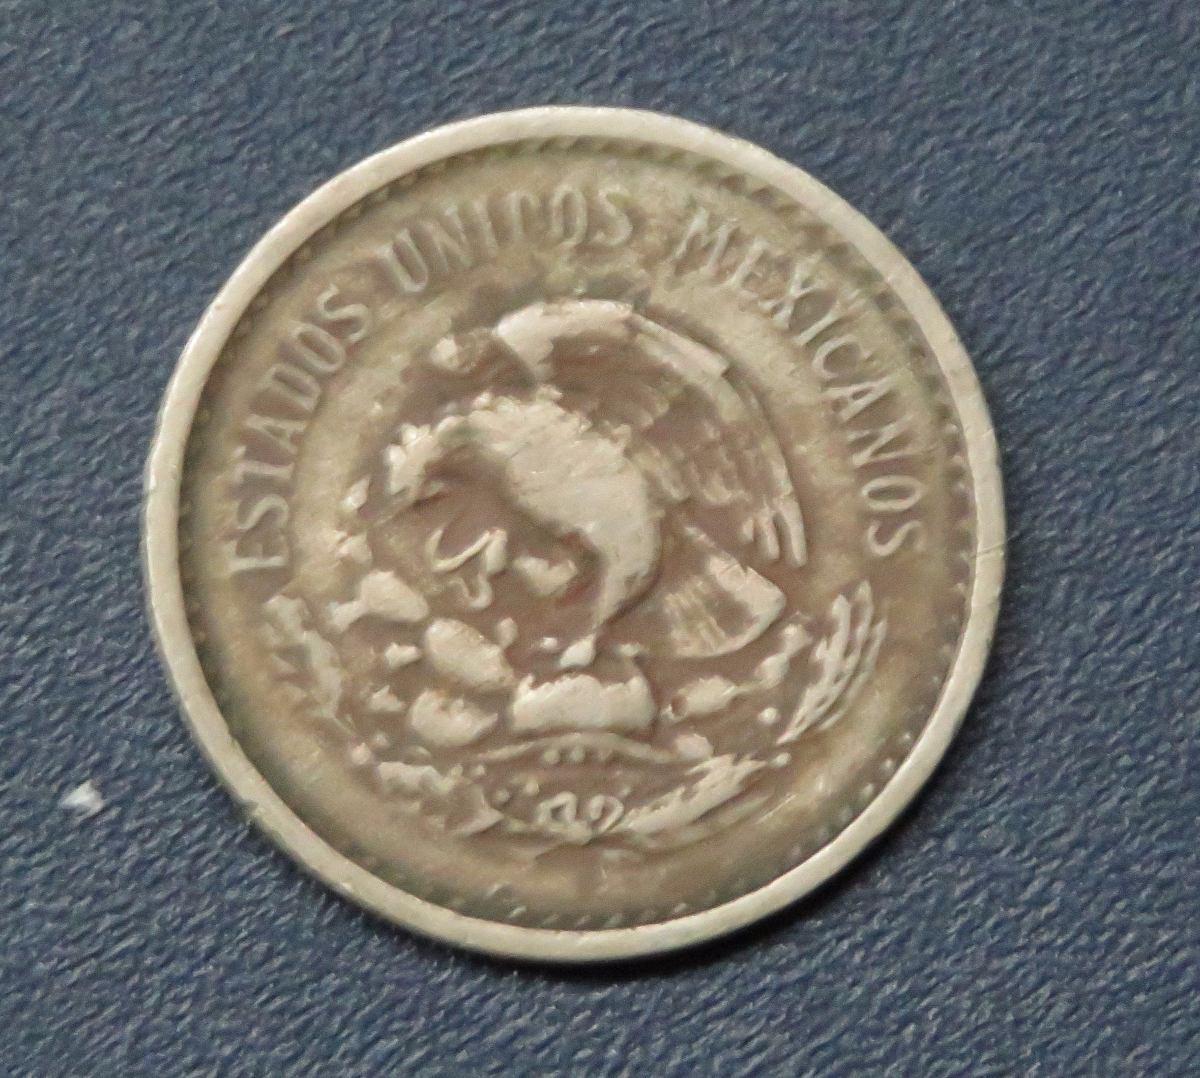 Calendario 1936.Ganga Moneda De 10 Centavos Calendario Azteca Ano 1936 35 00